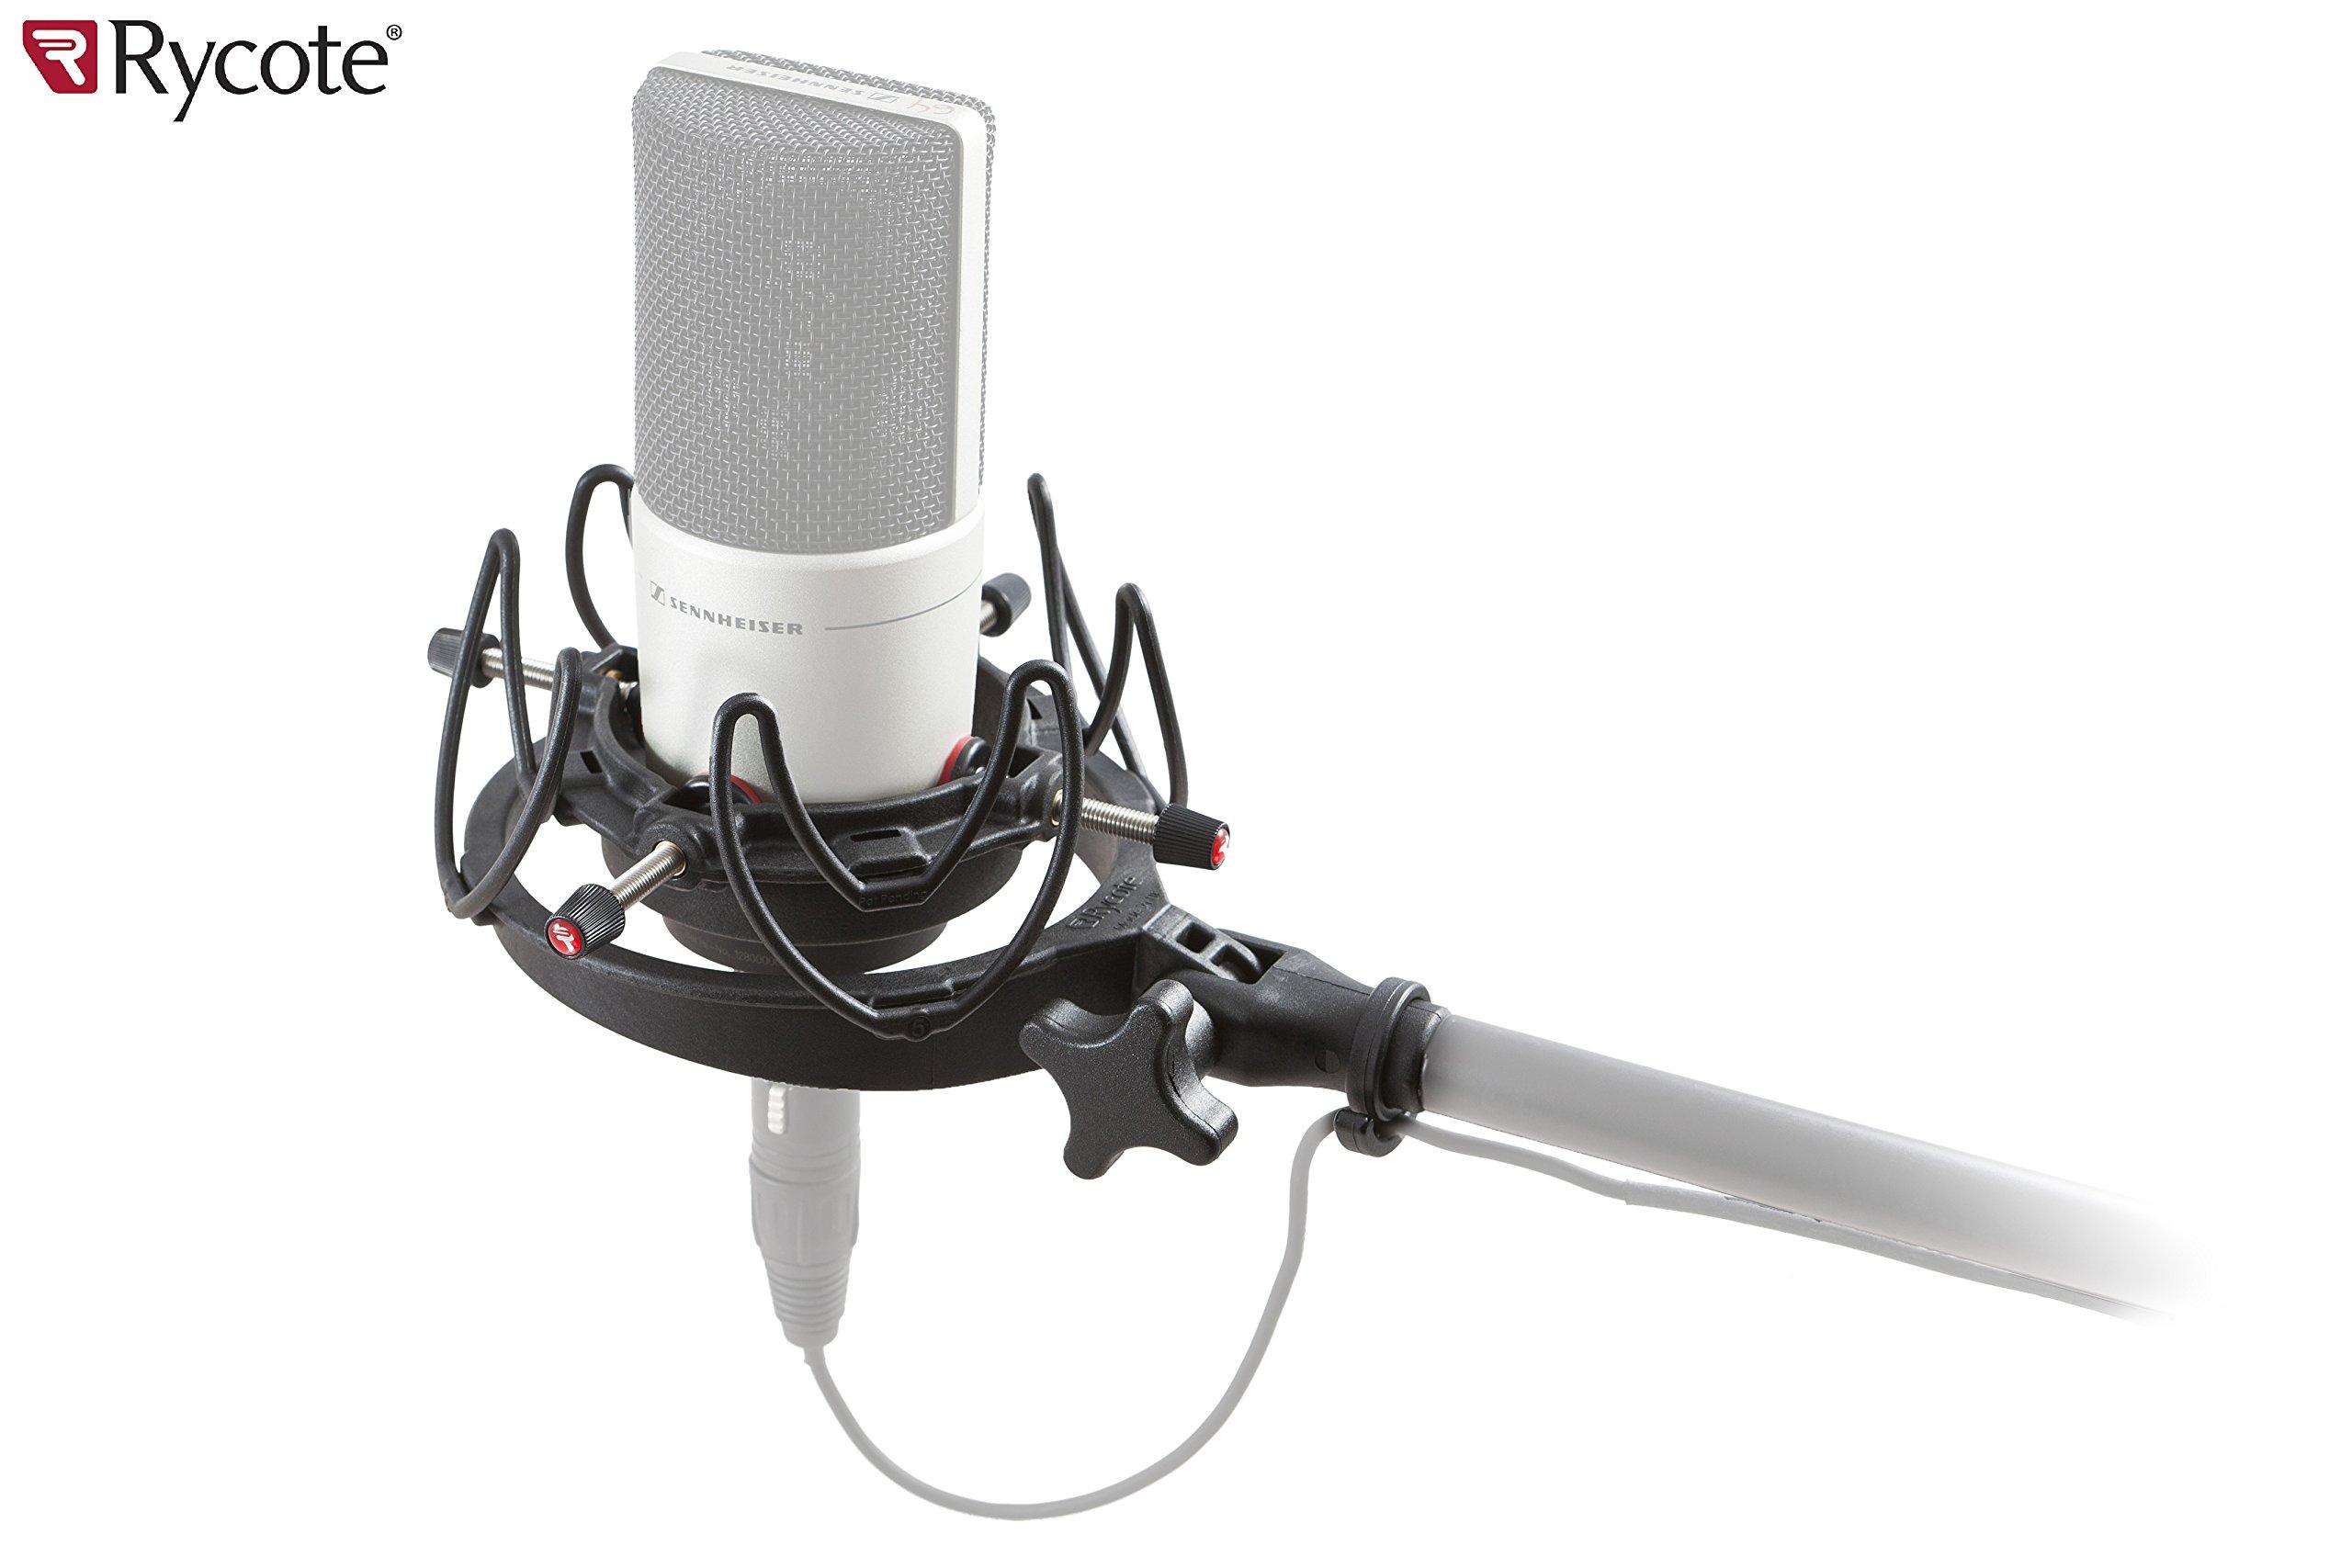 Rycote 44901 Invision USM Universal Studio Microphone Shock Mount by Rycote (Image #2)